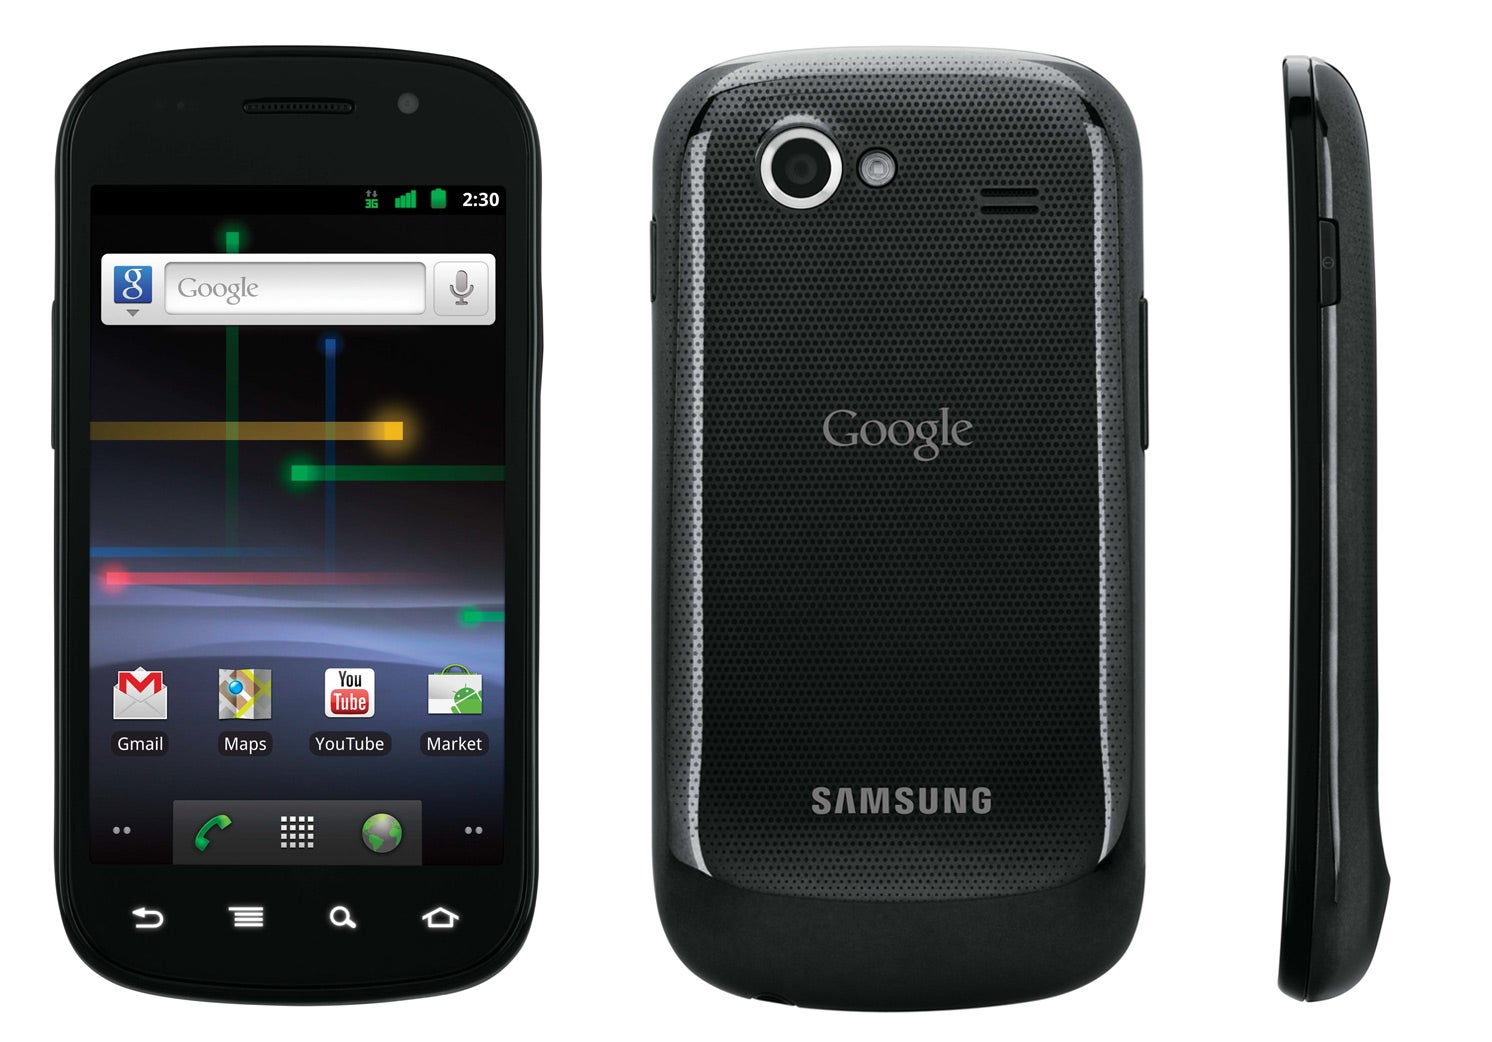 Samsung Nexus S: The New Official Google Phone